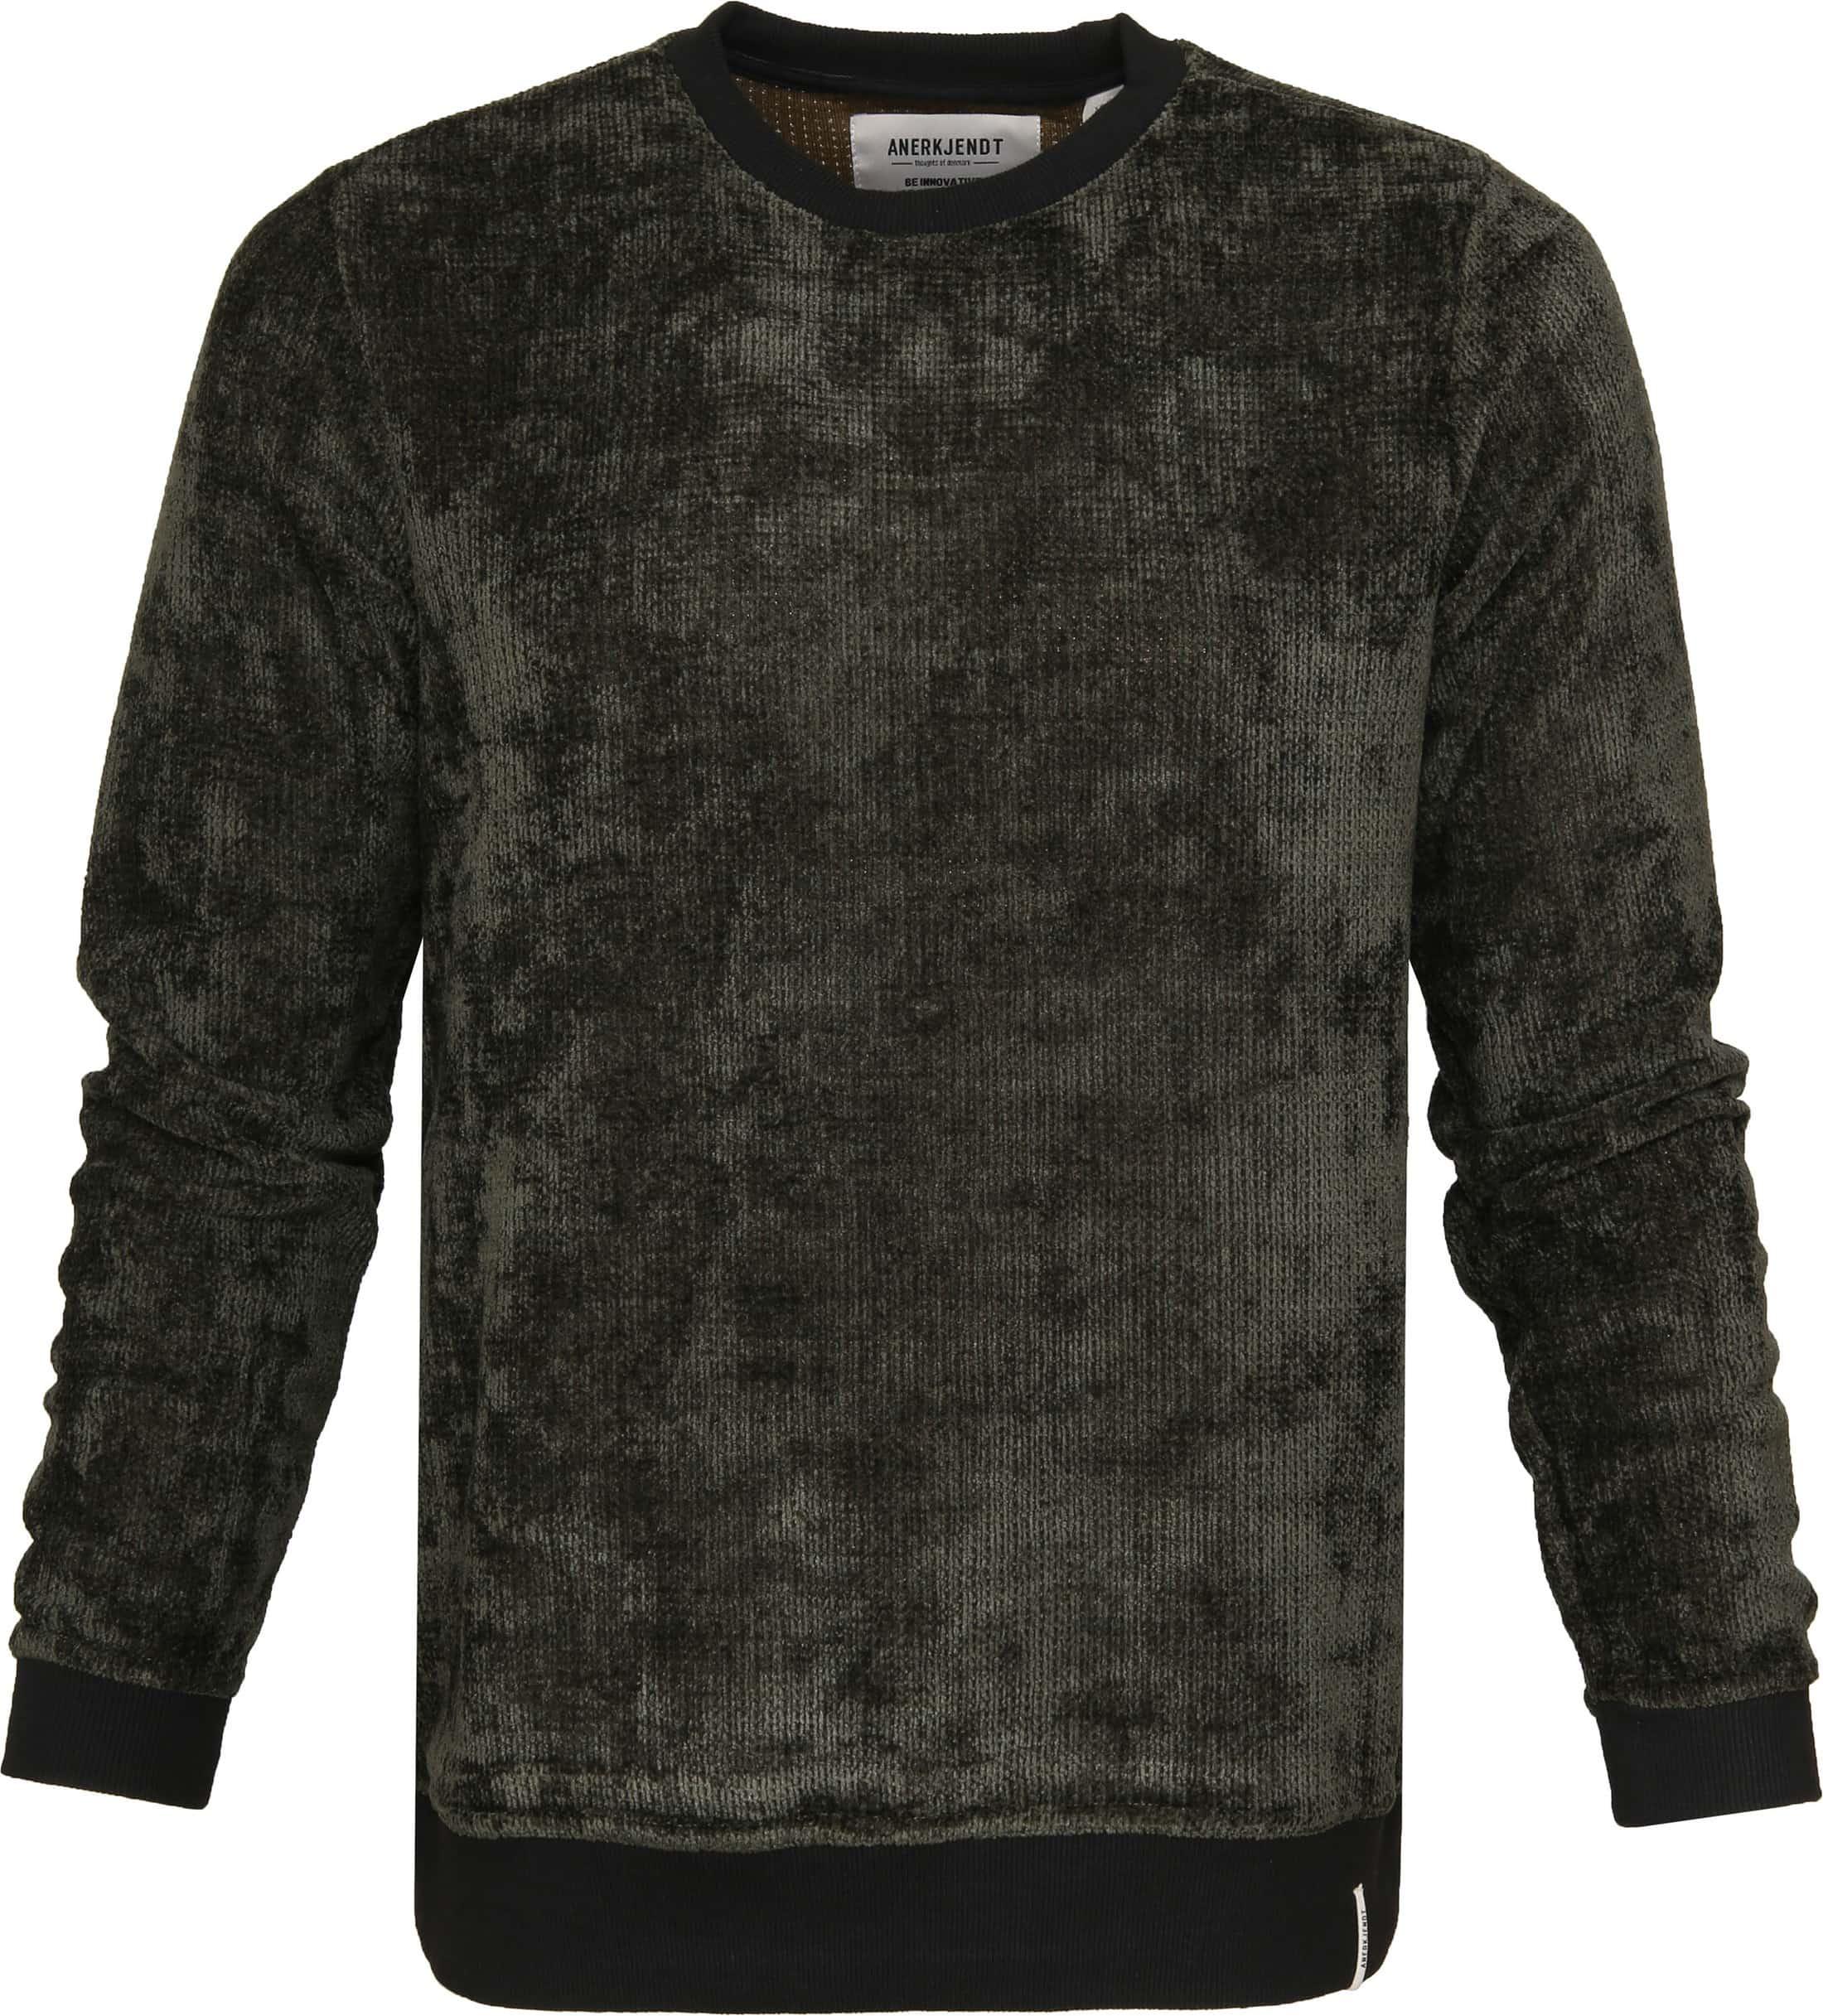 Anerkjendt Akalex Sweater Dunkelgrün foto 0